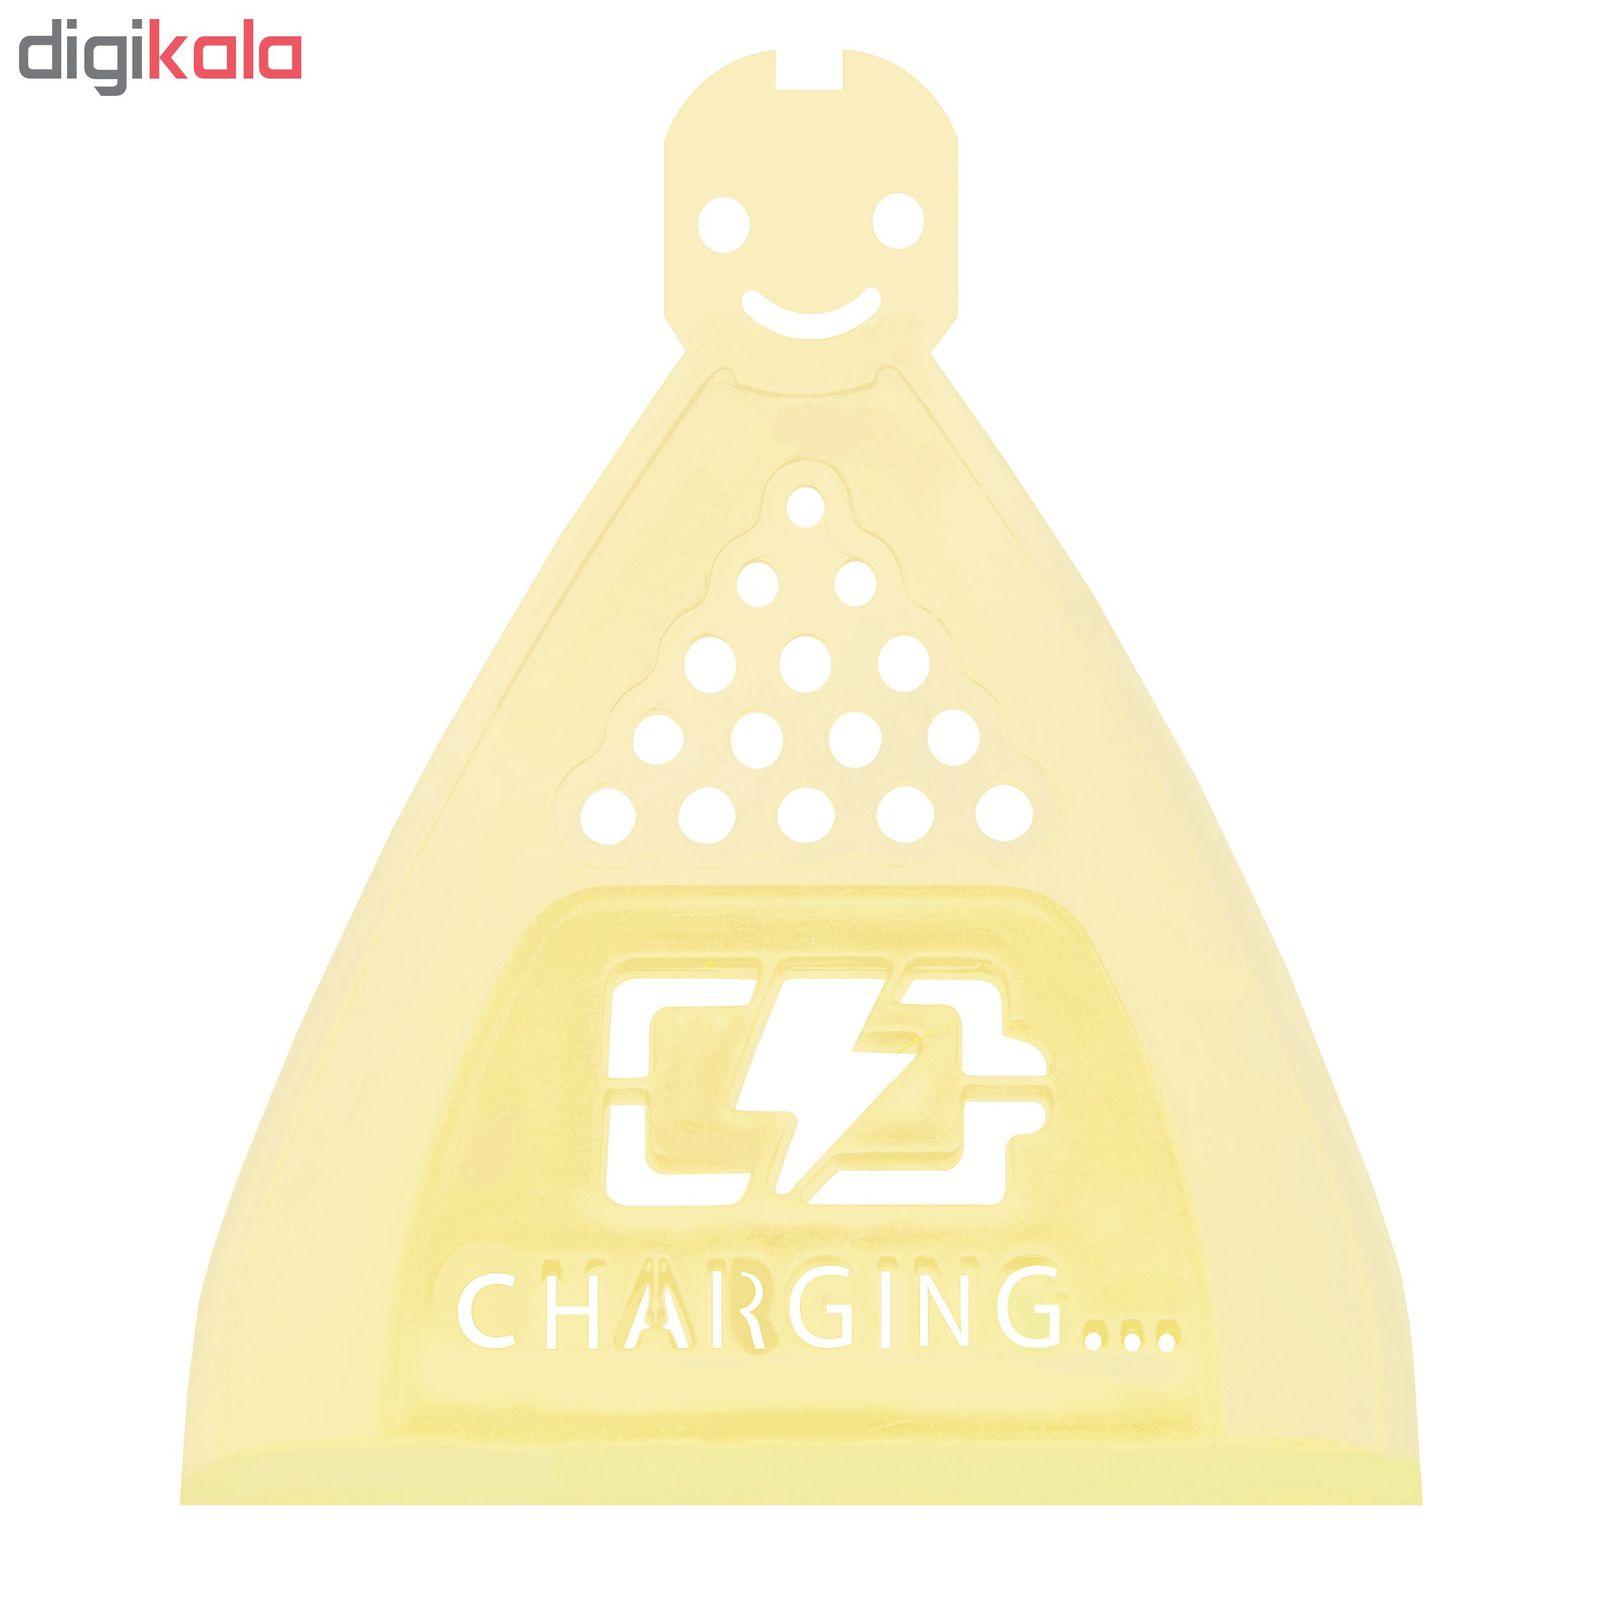 پایه نگهدارنده شارژر موبایل مدل Hng 0229 main 1 18